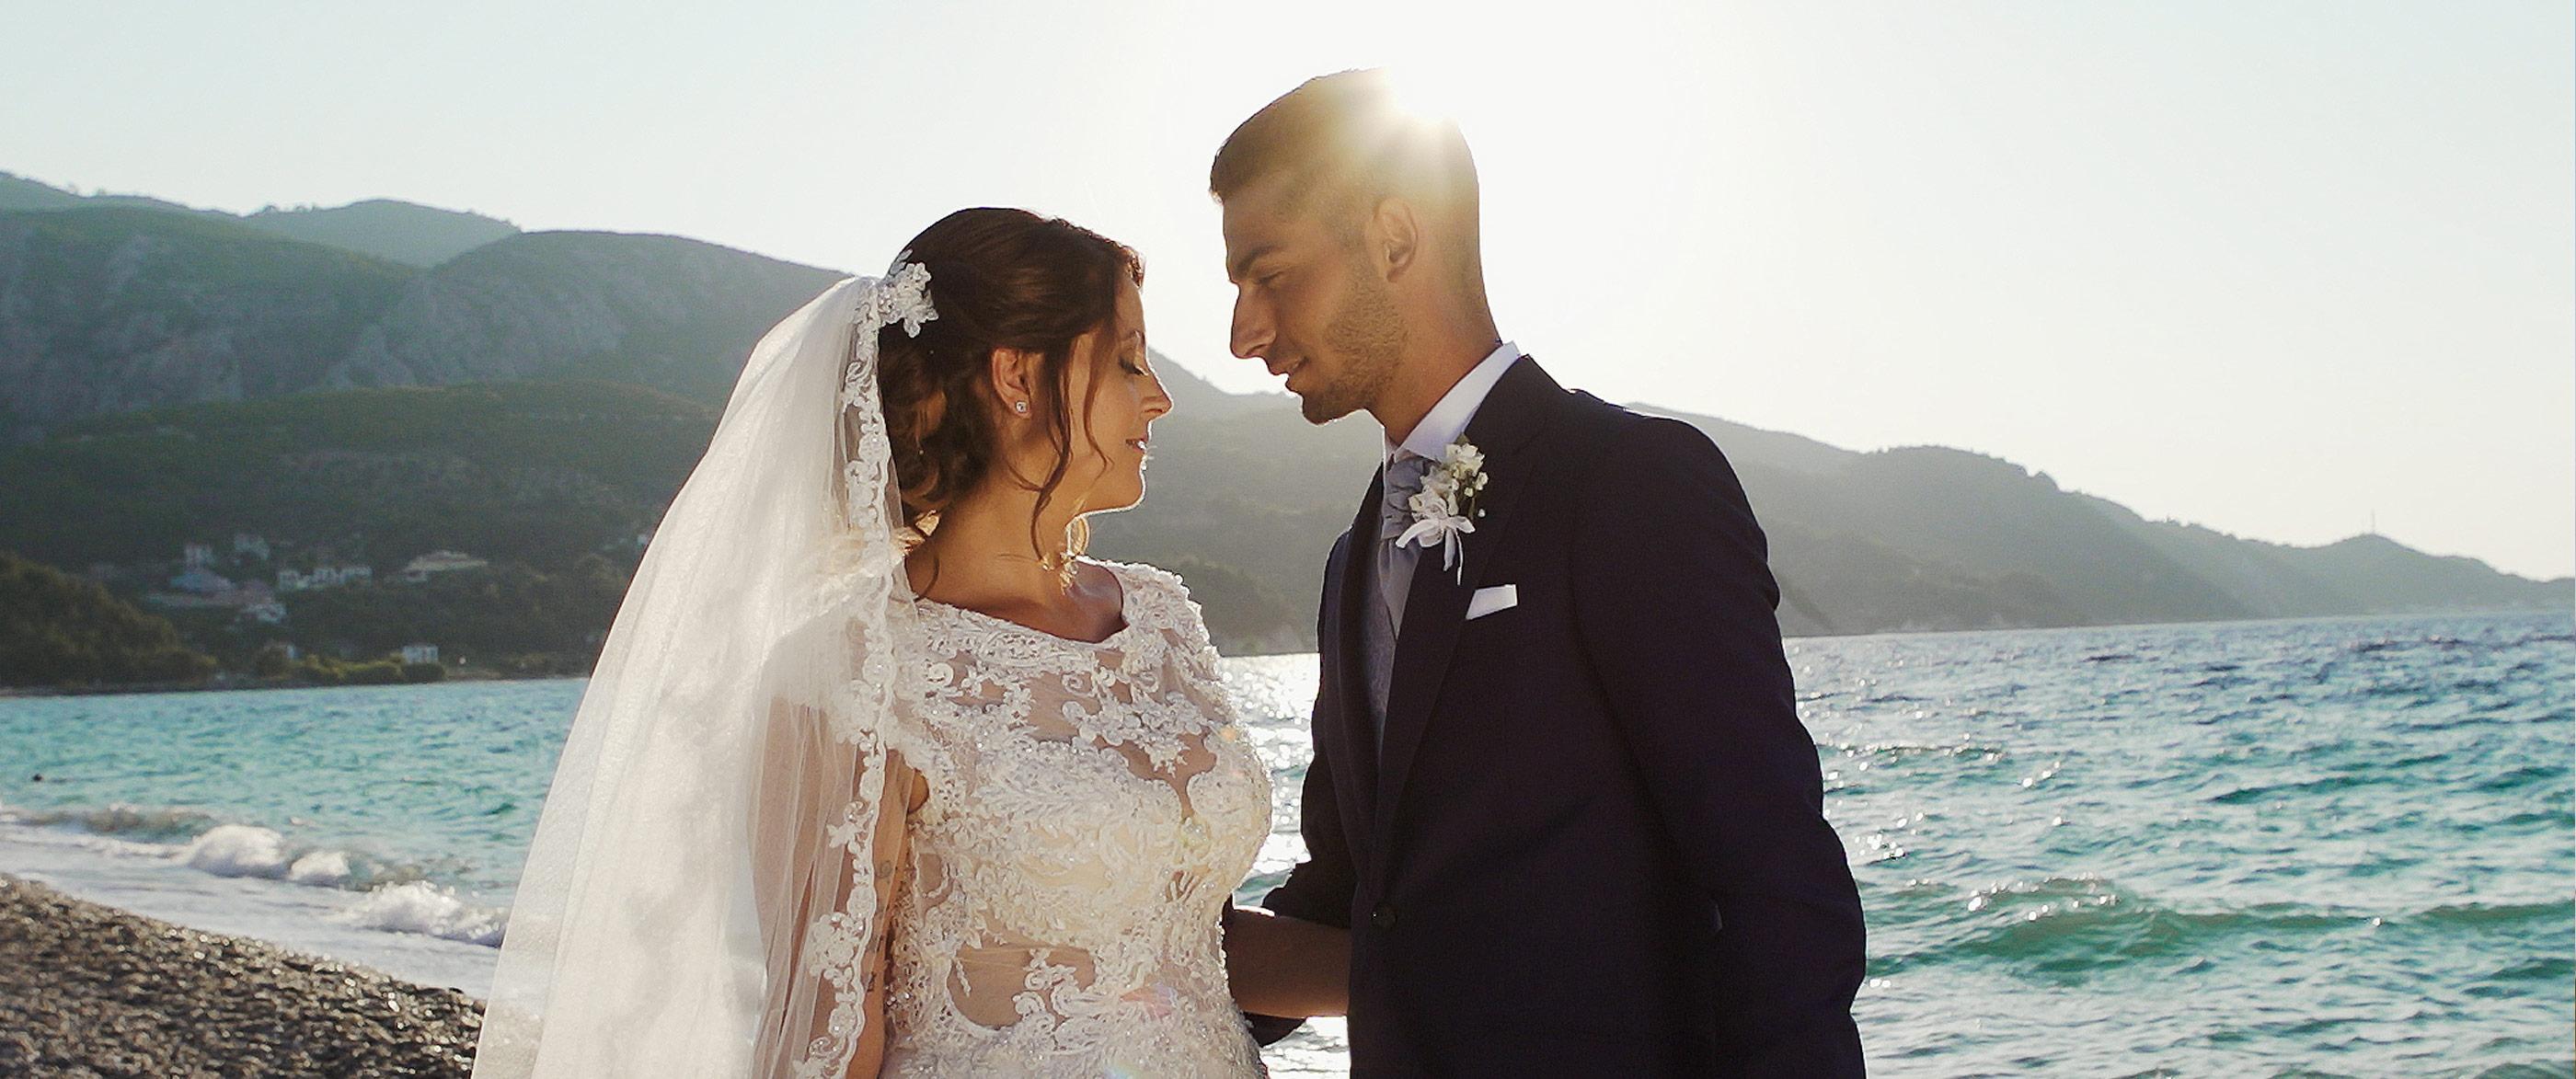 Hochzeitsfilm Elena & Paulo, Samos Griechenland 2019